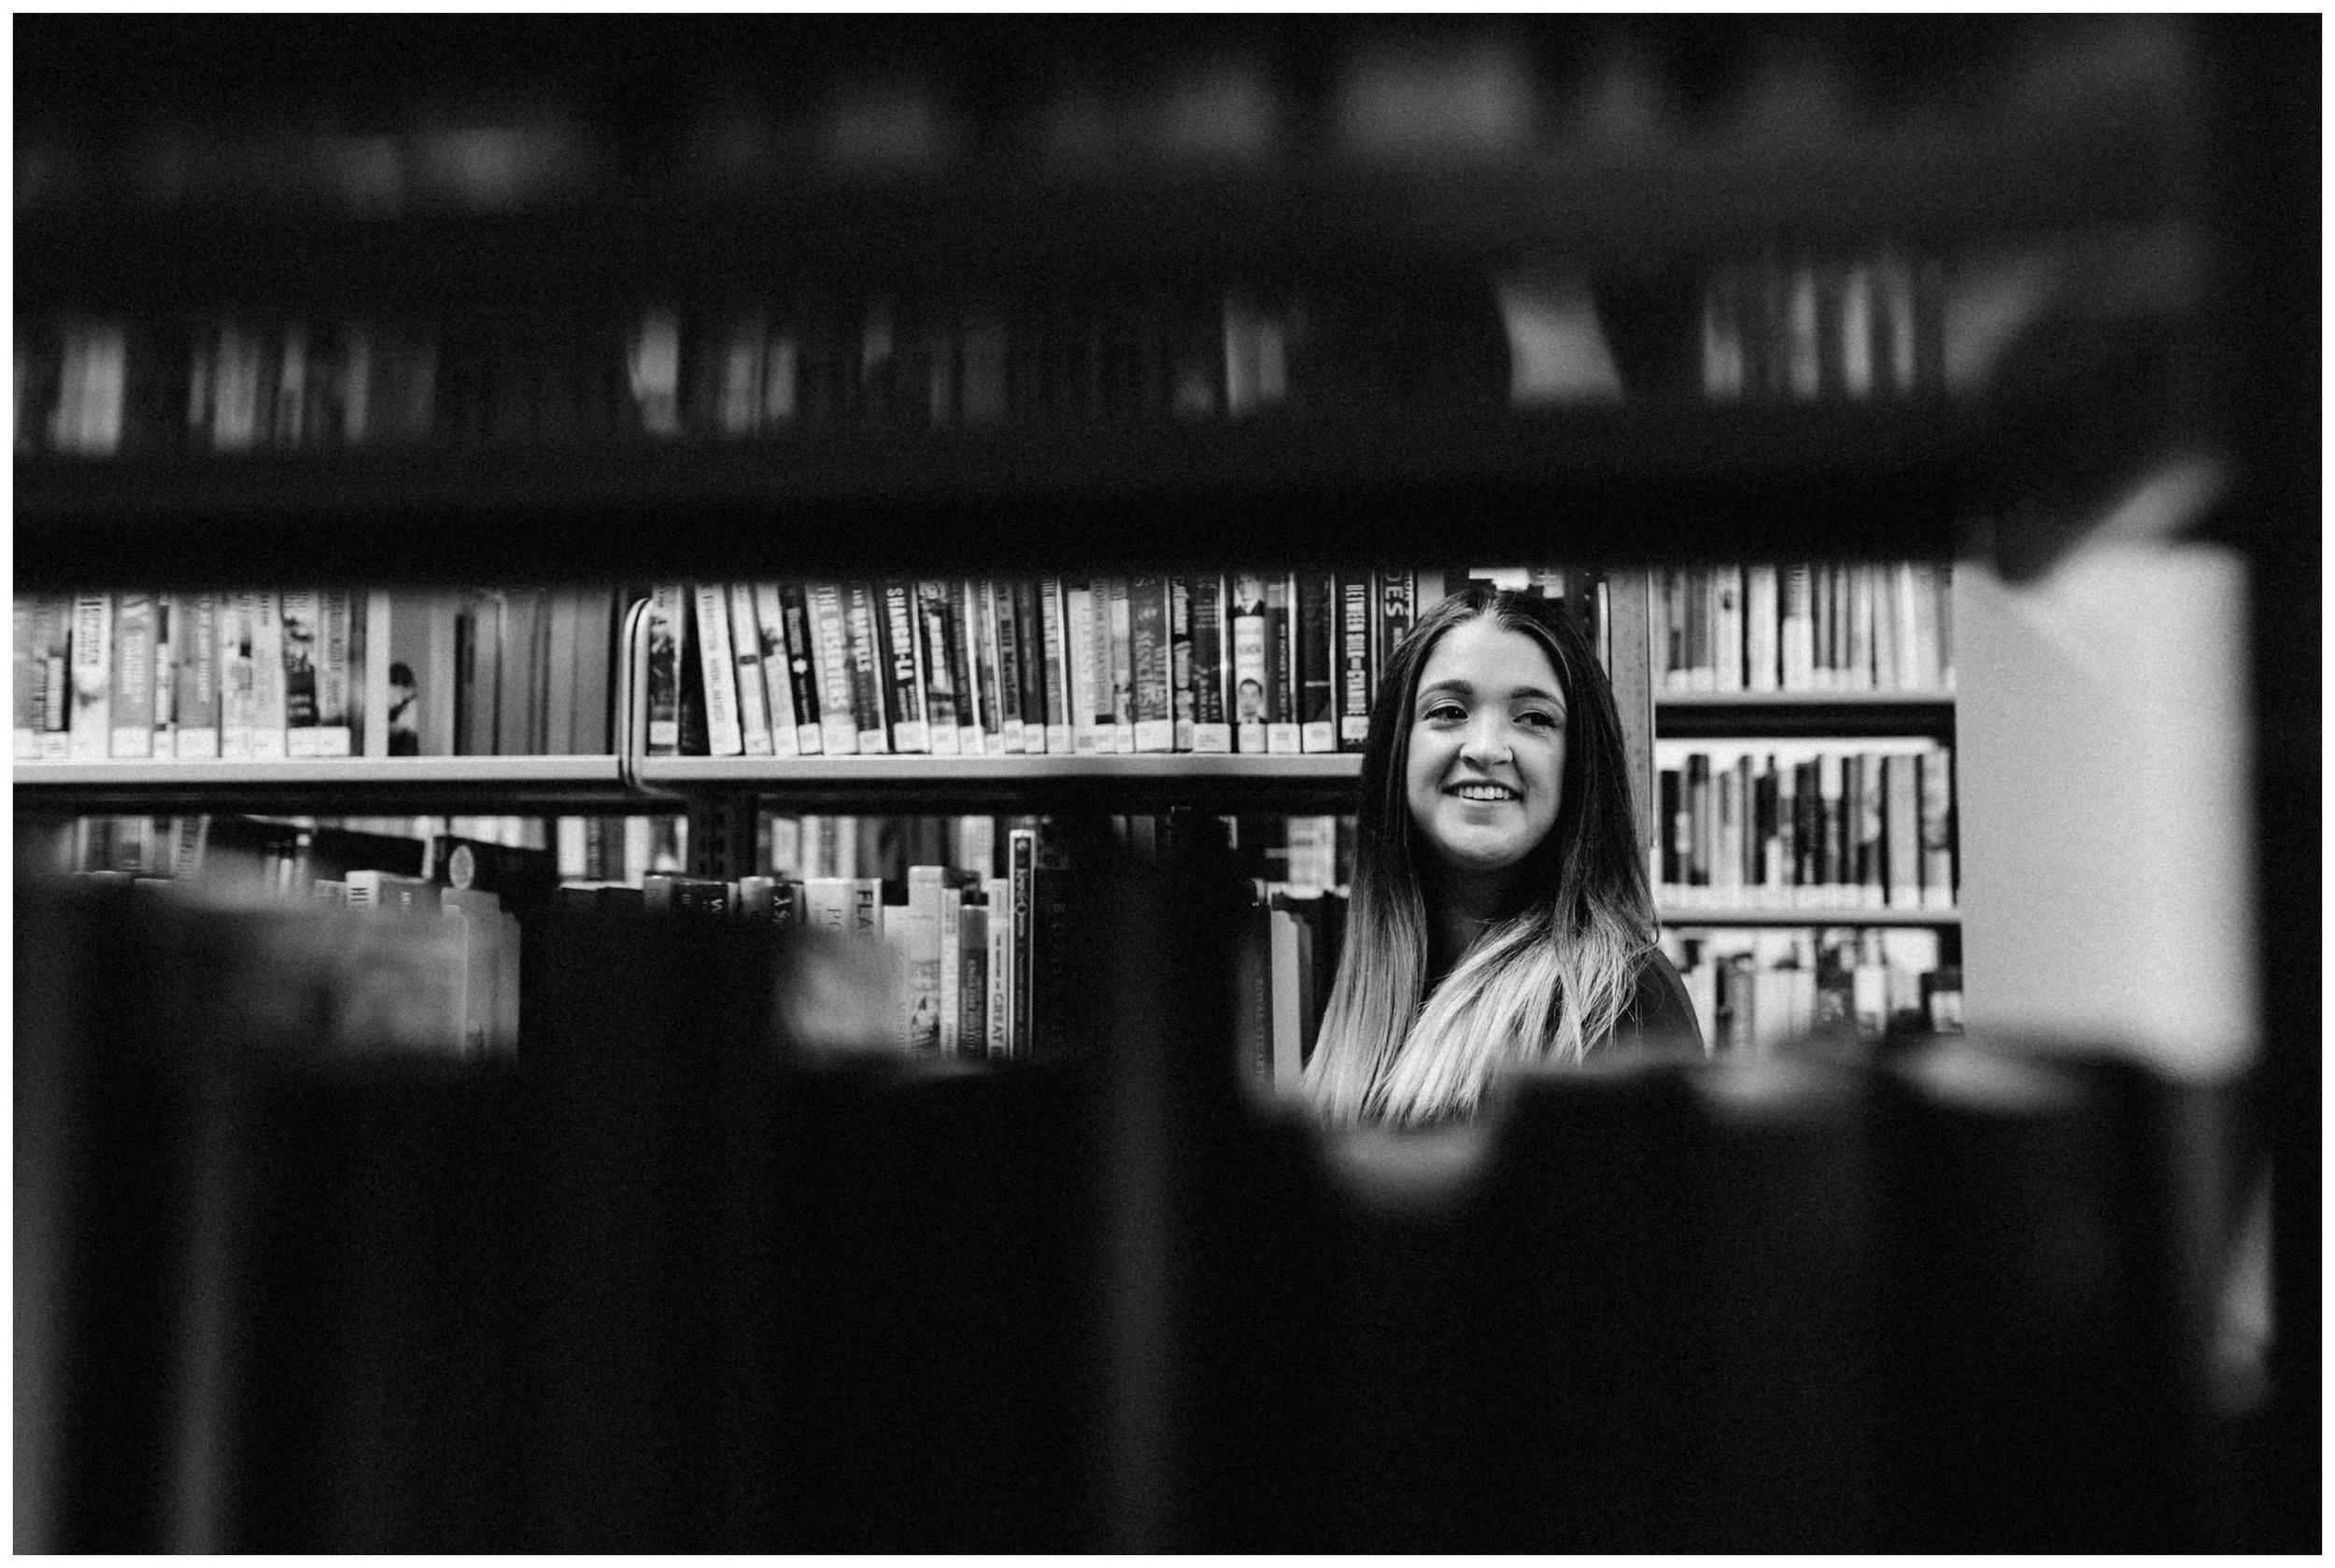 Makayla Madden Photography Boise, Idaho Senior, Boudoir, and Wedding Photographer Senior Girl Class of 2017 Library Books Eagle